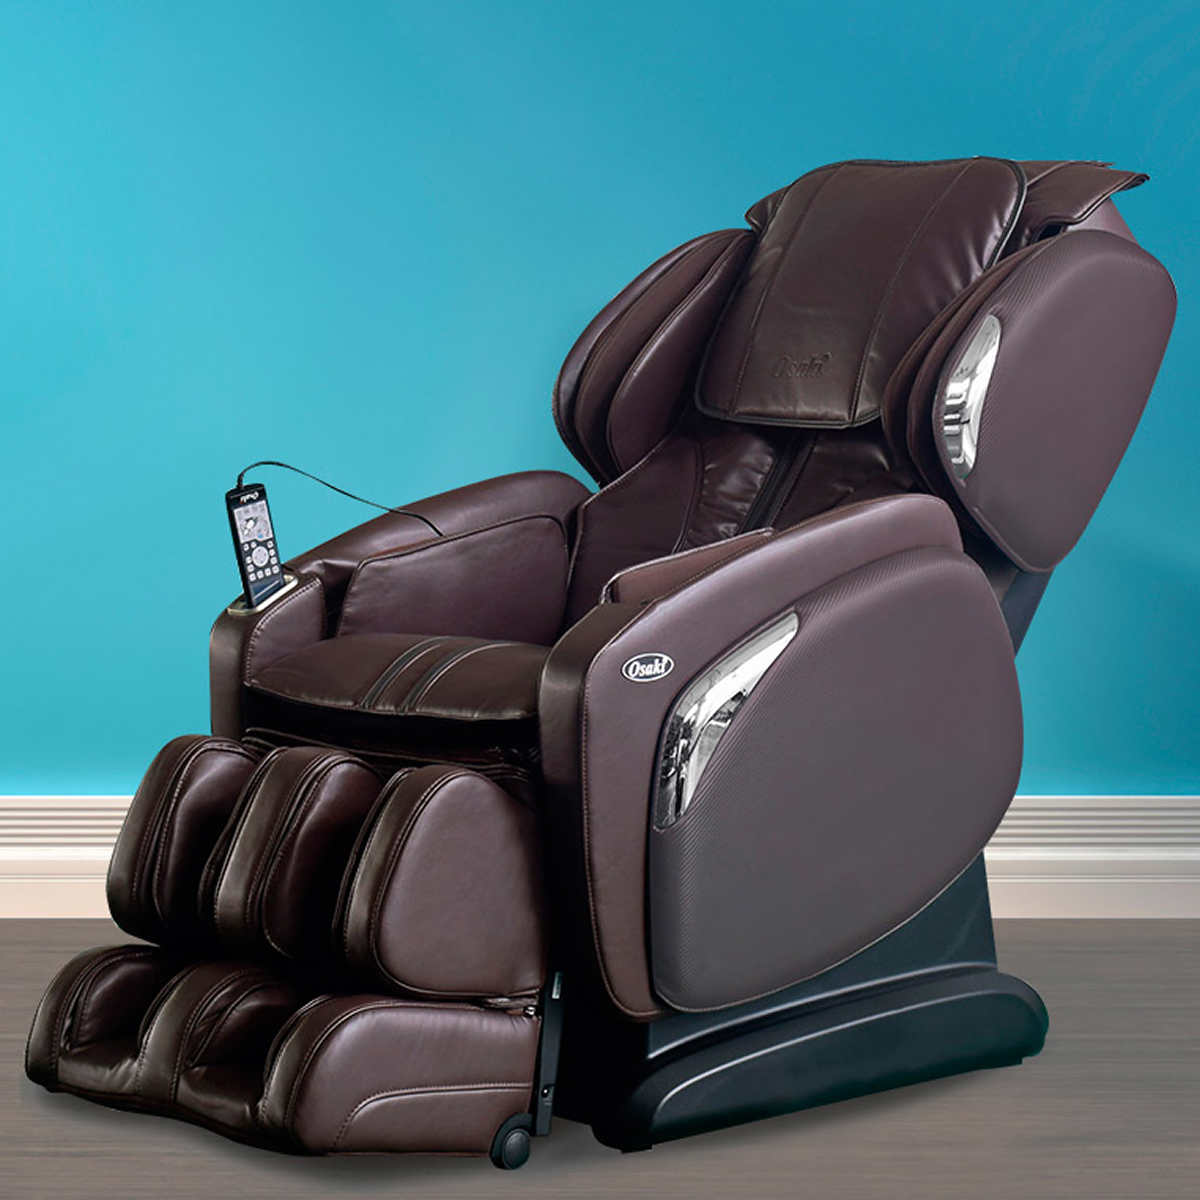 Osaki OS 4000CS Massage ChairMassage Chairs   Costco. Infinity Massage Chairs Canada. Home Design Ideas